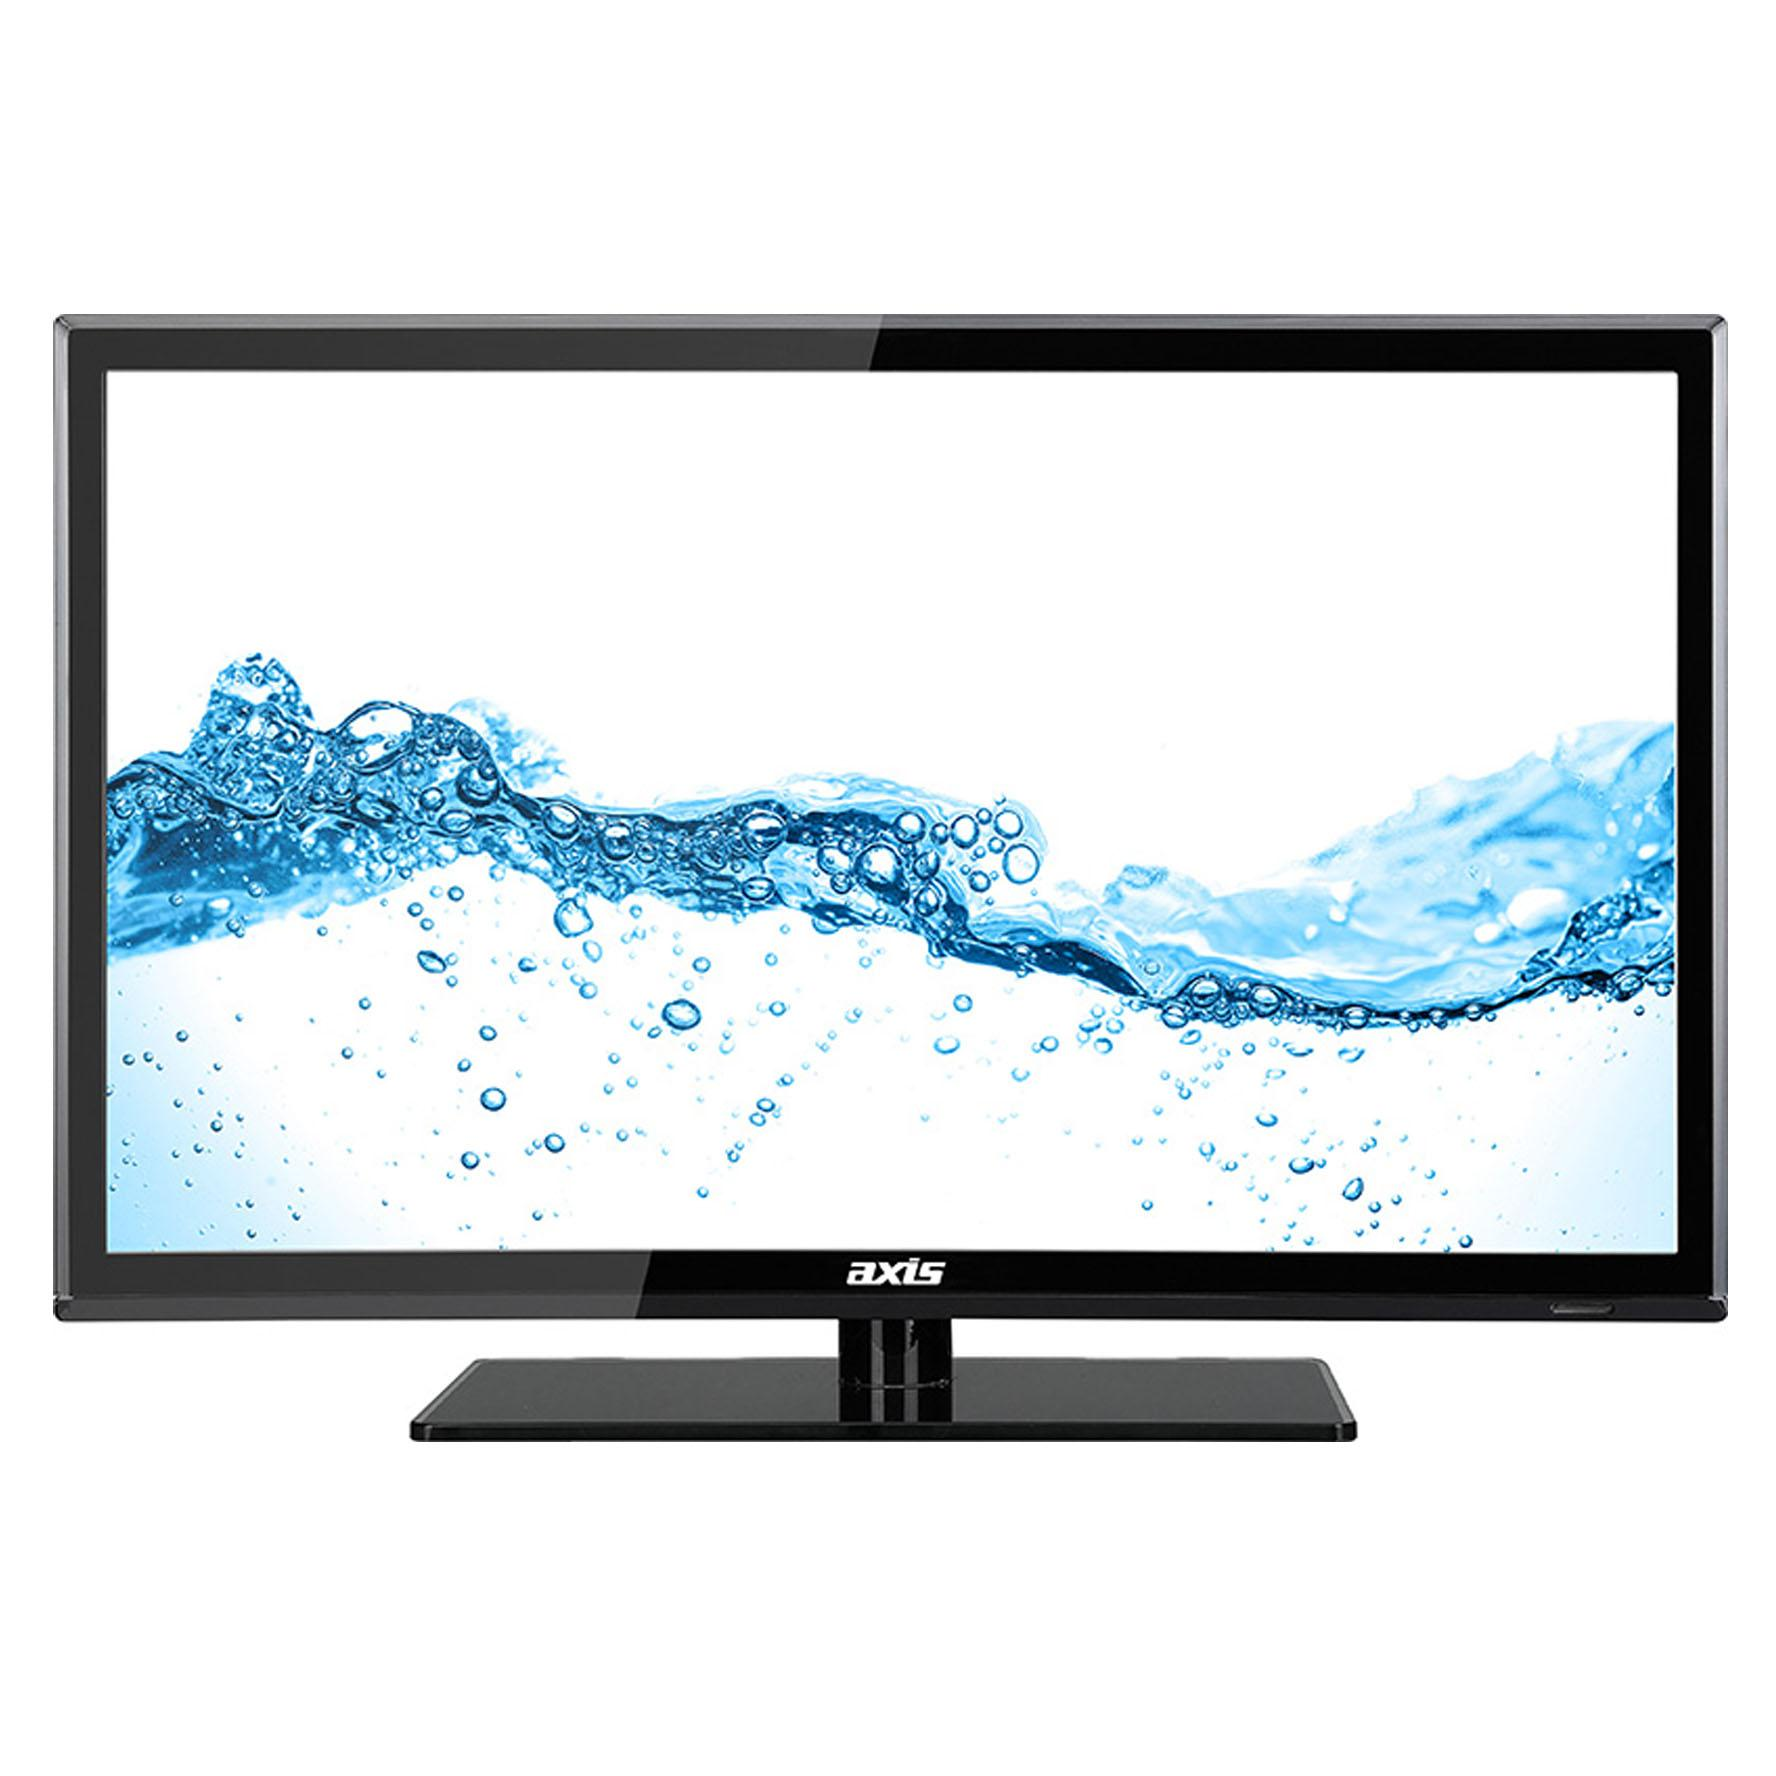 axis ax1522 series 2 22 dvd tv multimedia home of 12 volt. Black Bedroom Furniture Sets. Home Design Ideas